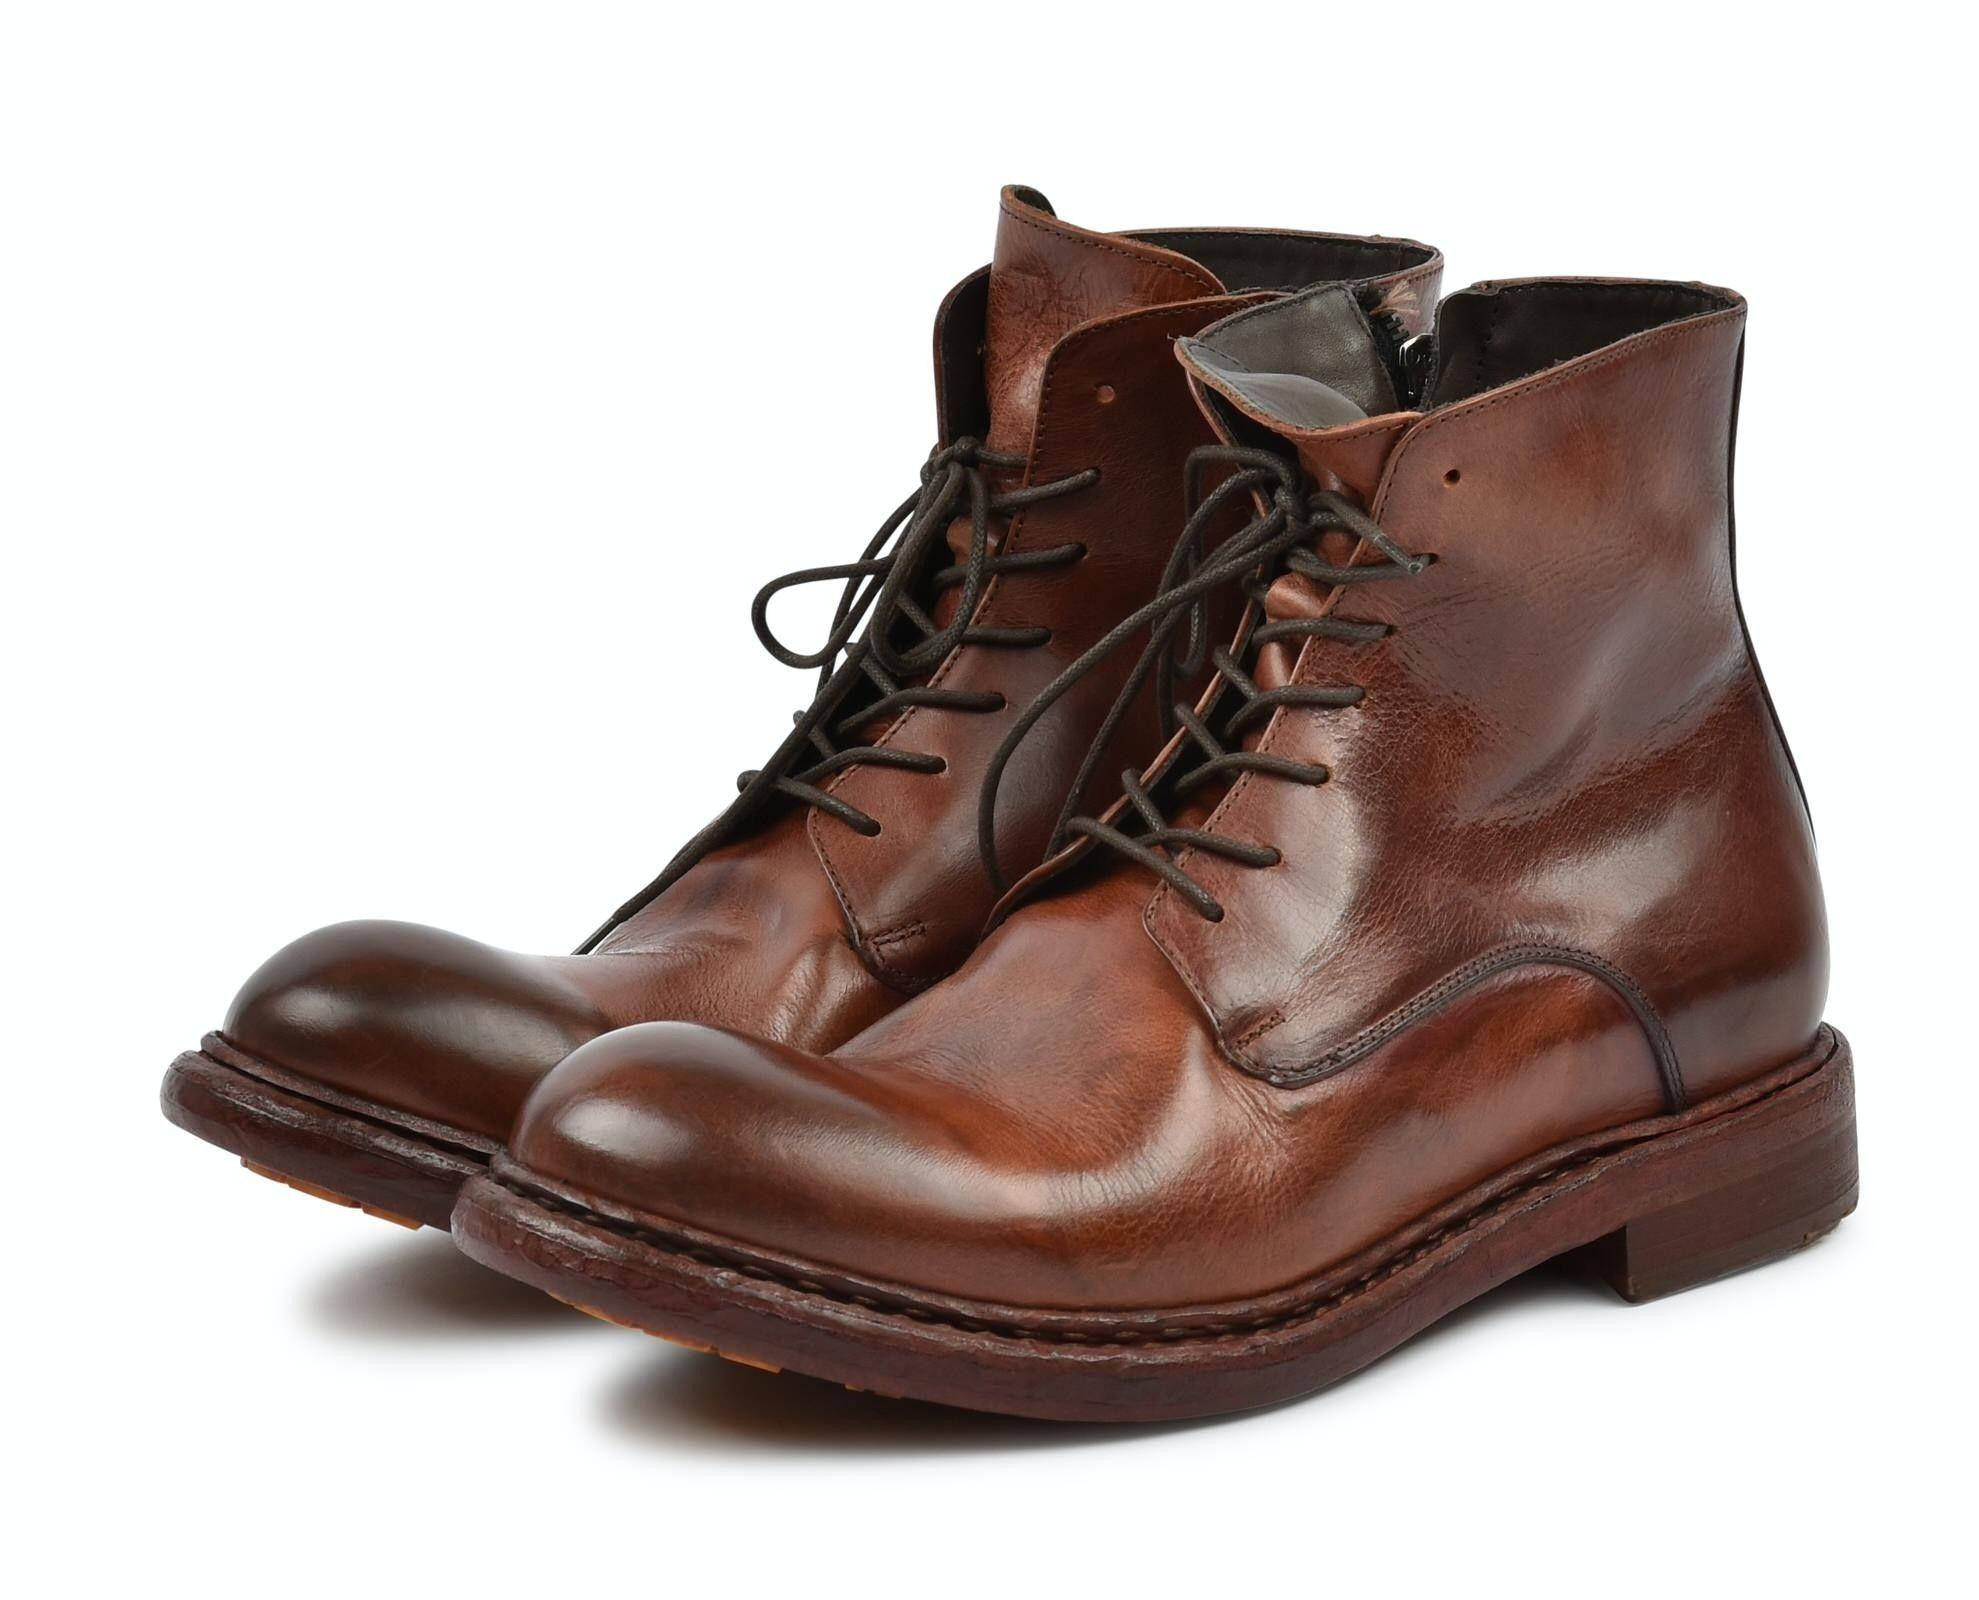 CRISPINIANO - Herren Schuhe - Macai Brandy Cuoio Roccia Giallo - Brandy